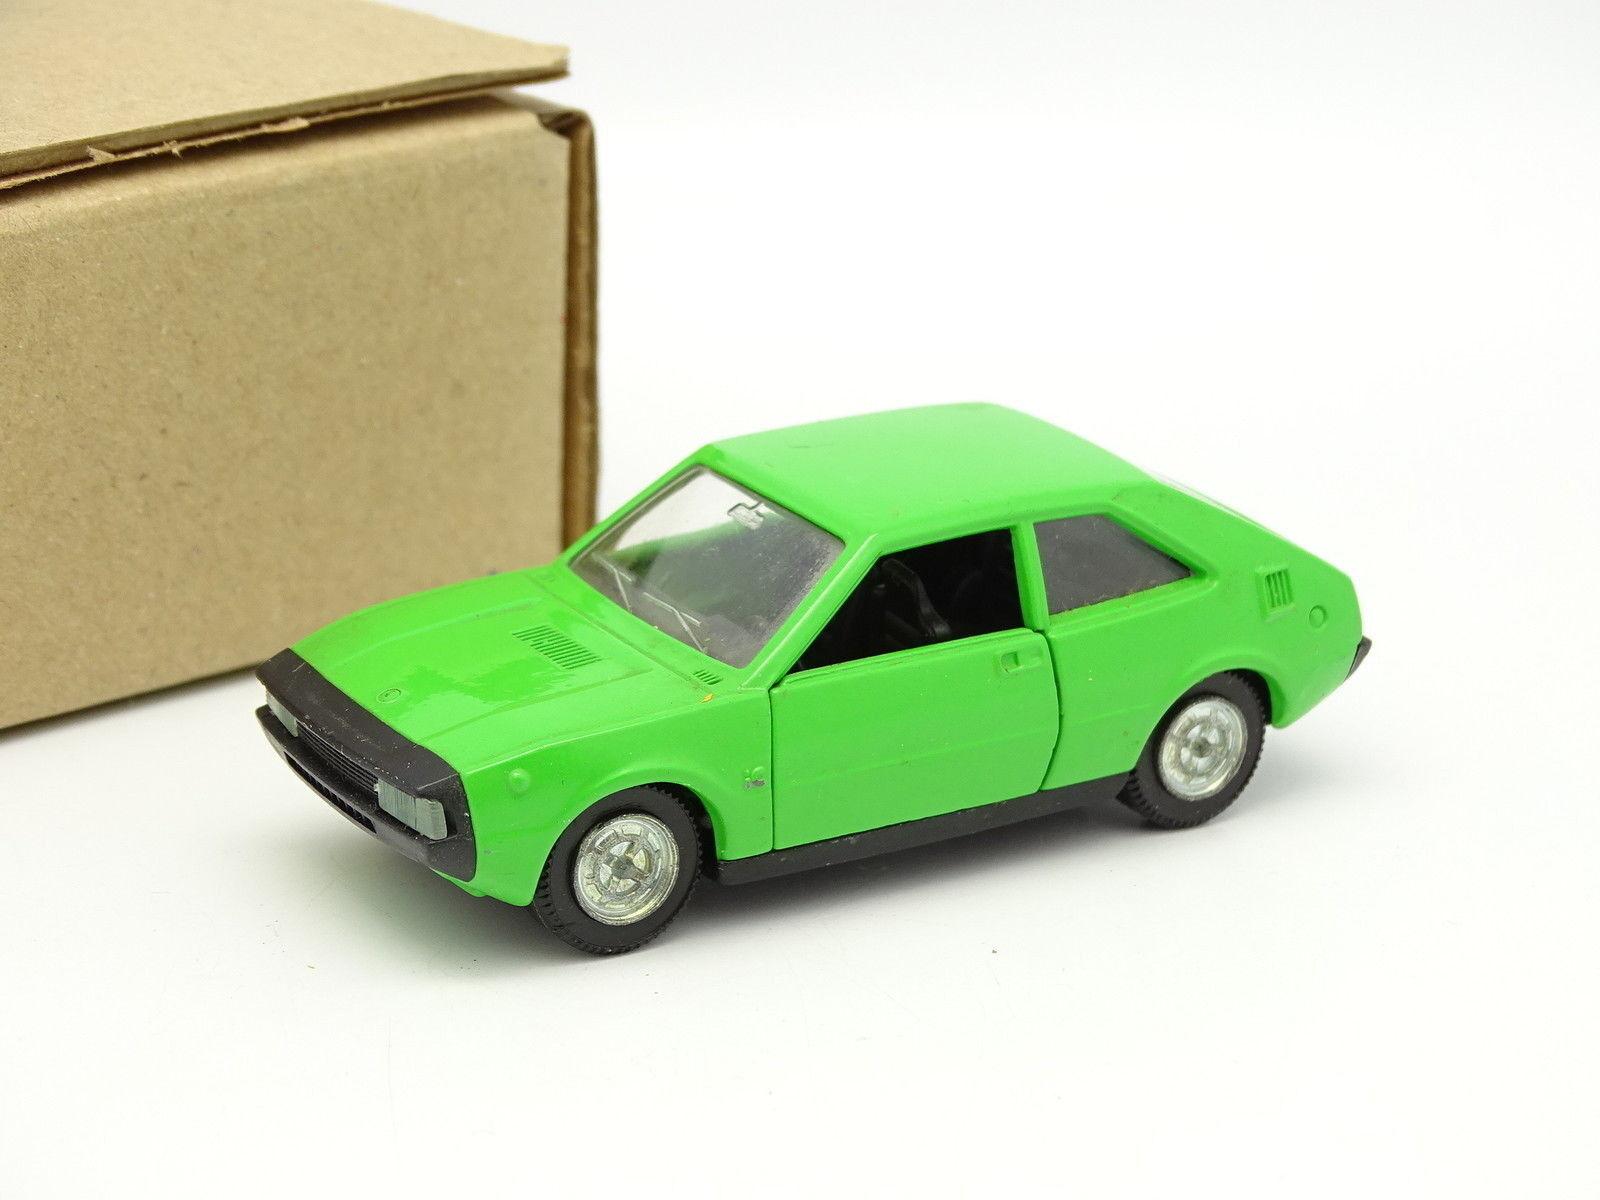 edición limitada en caliente Pilen Sb Sb Sb 1 43 - Seat 1200 verde  autorización oficial